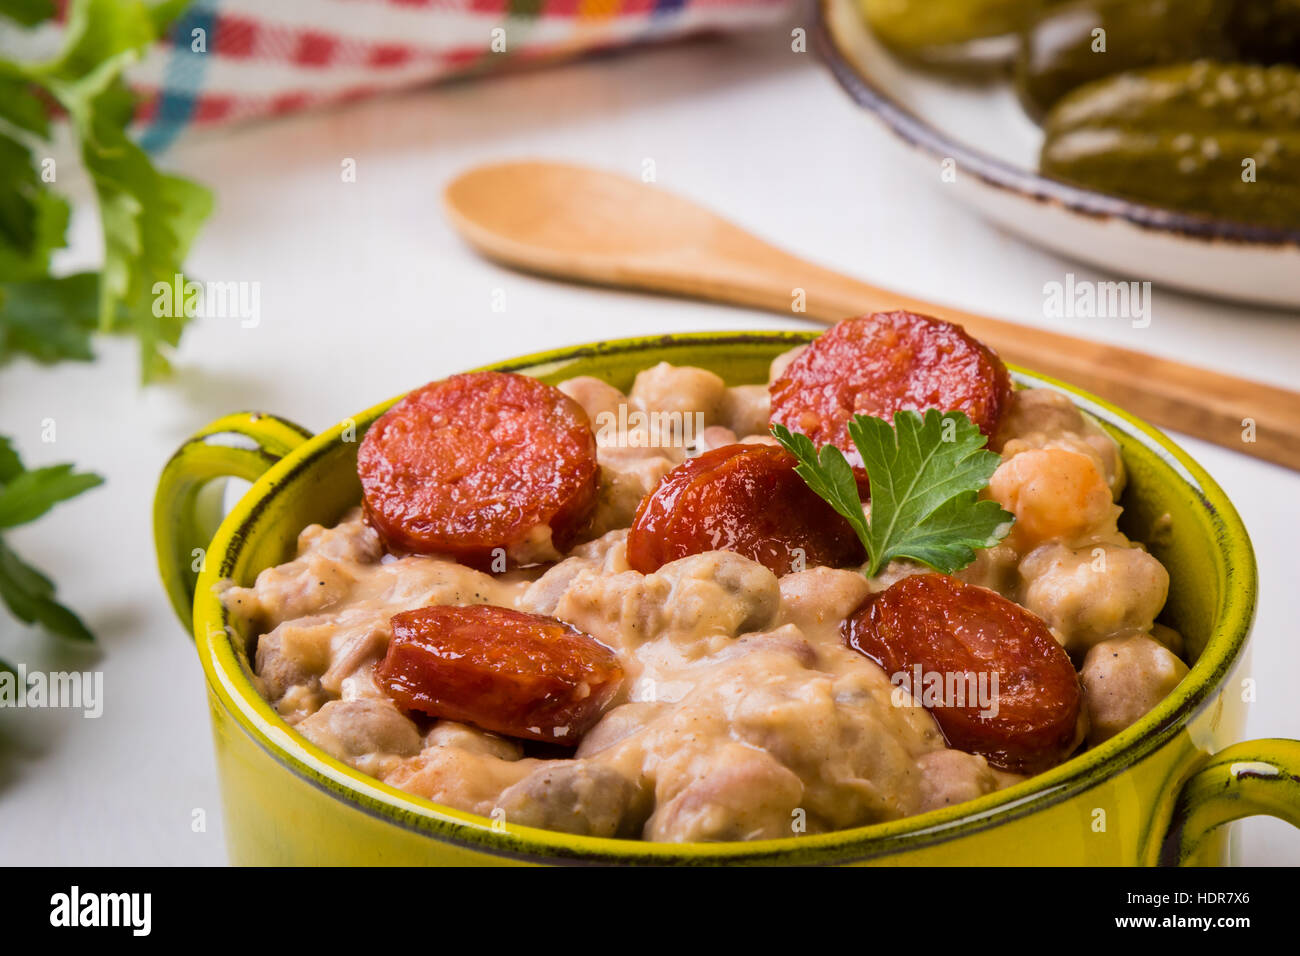 Un guiso de alubias con salchichas en tazón verde Imagen De Stock